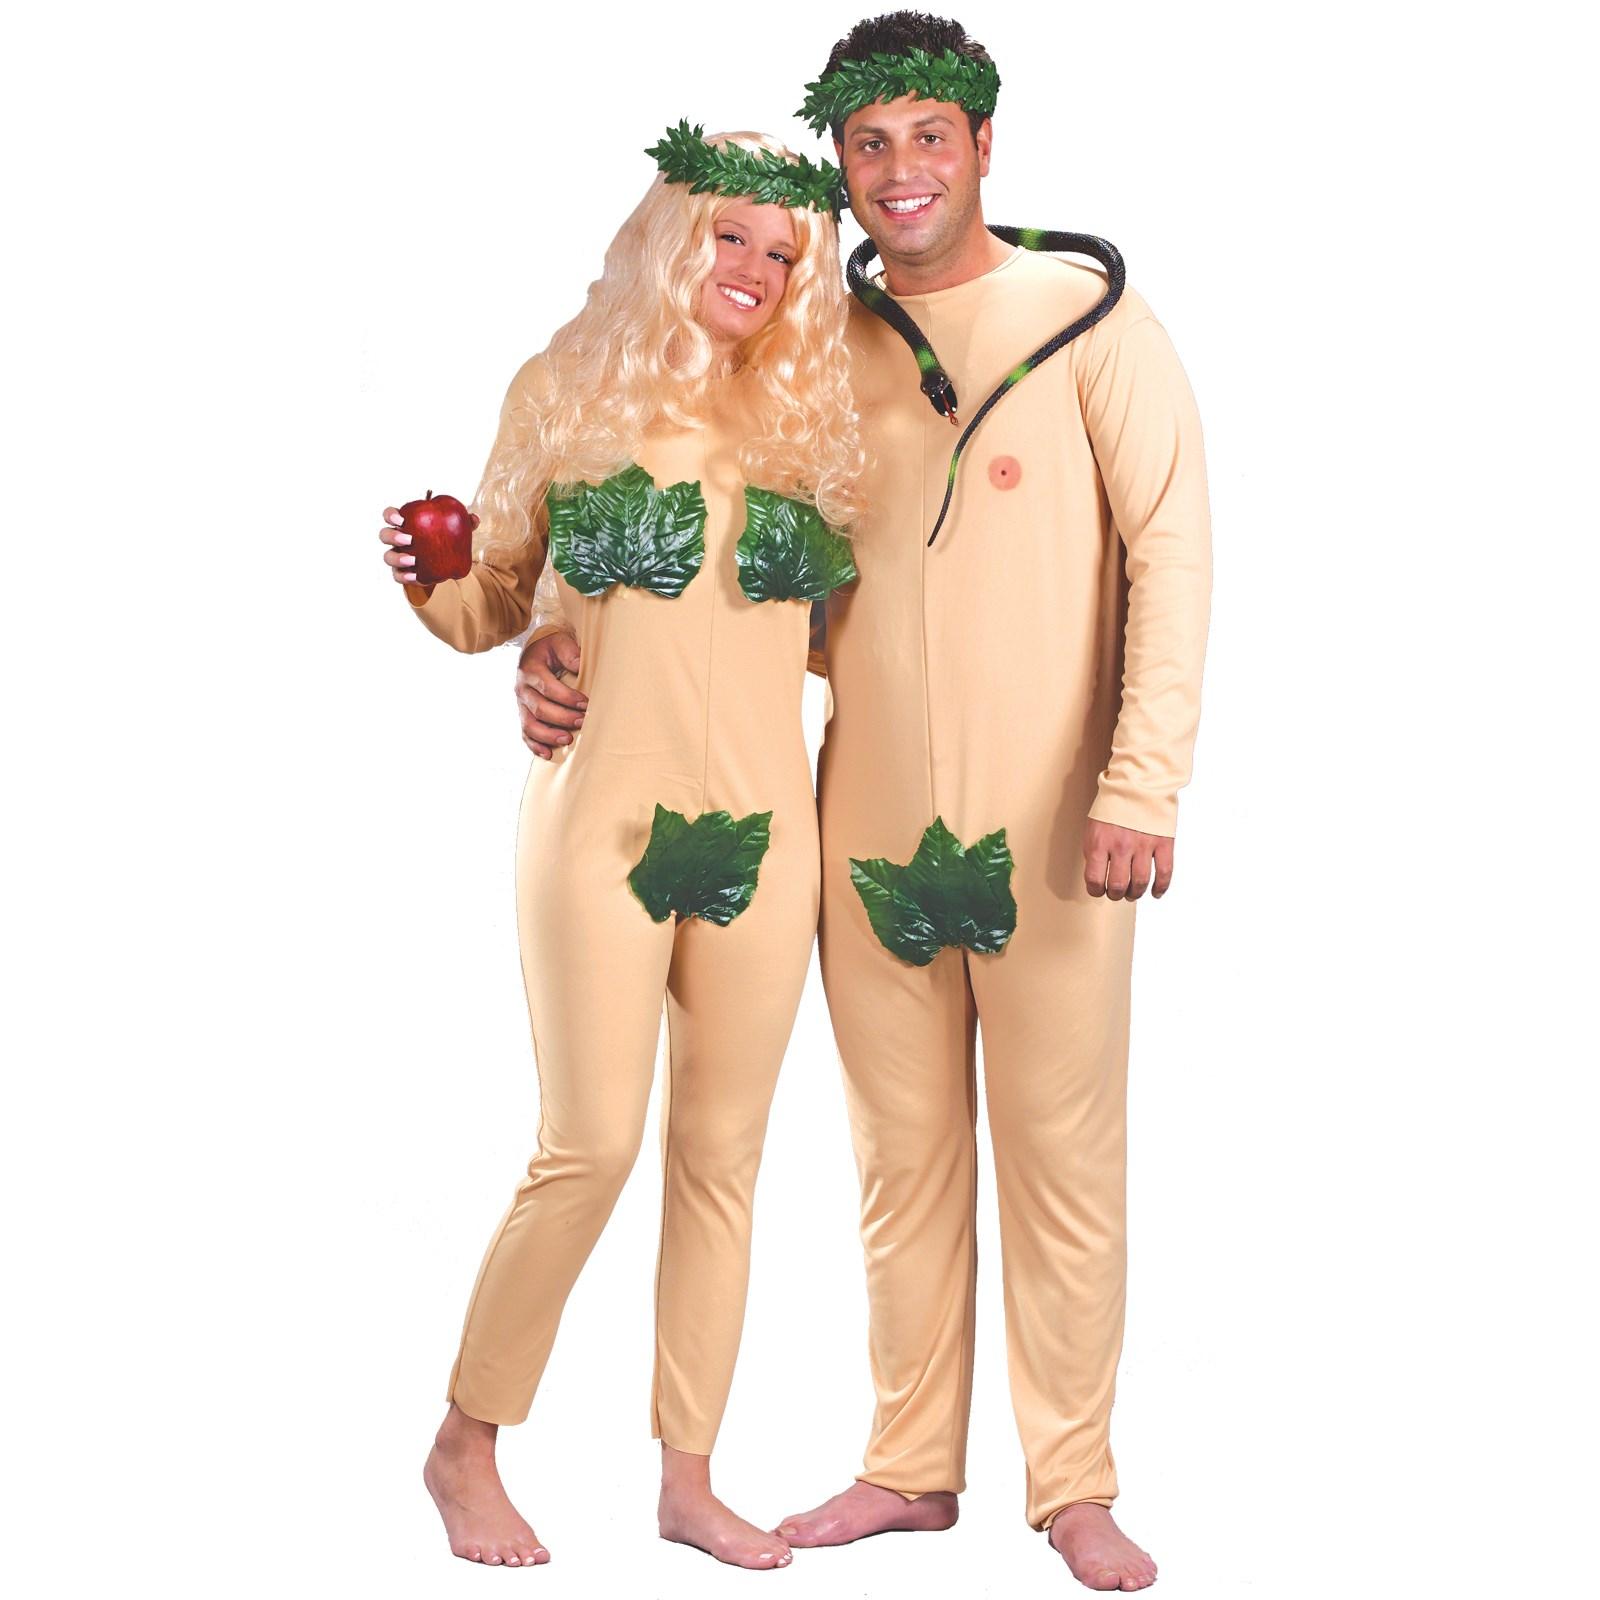 Image of Adam Eve Adult Costume